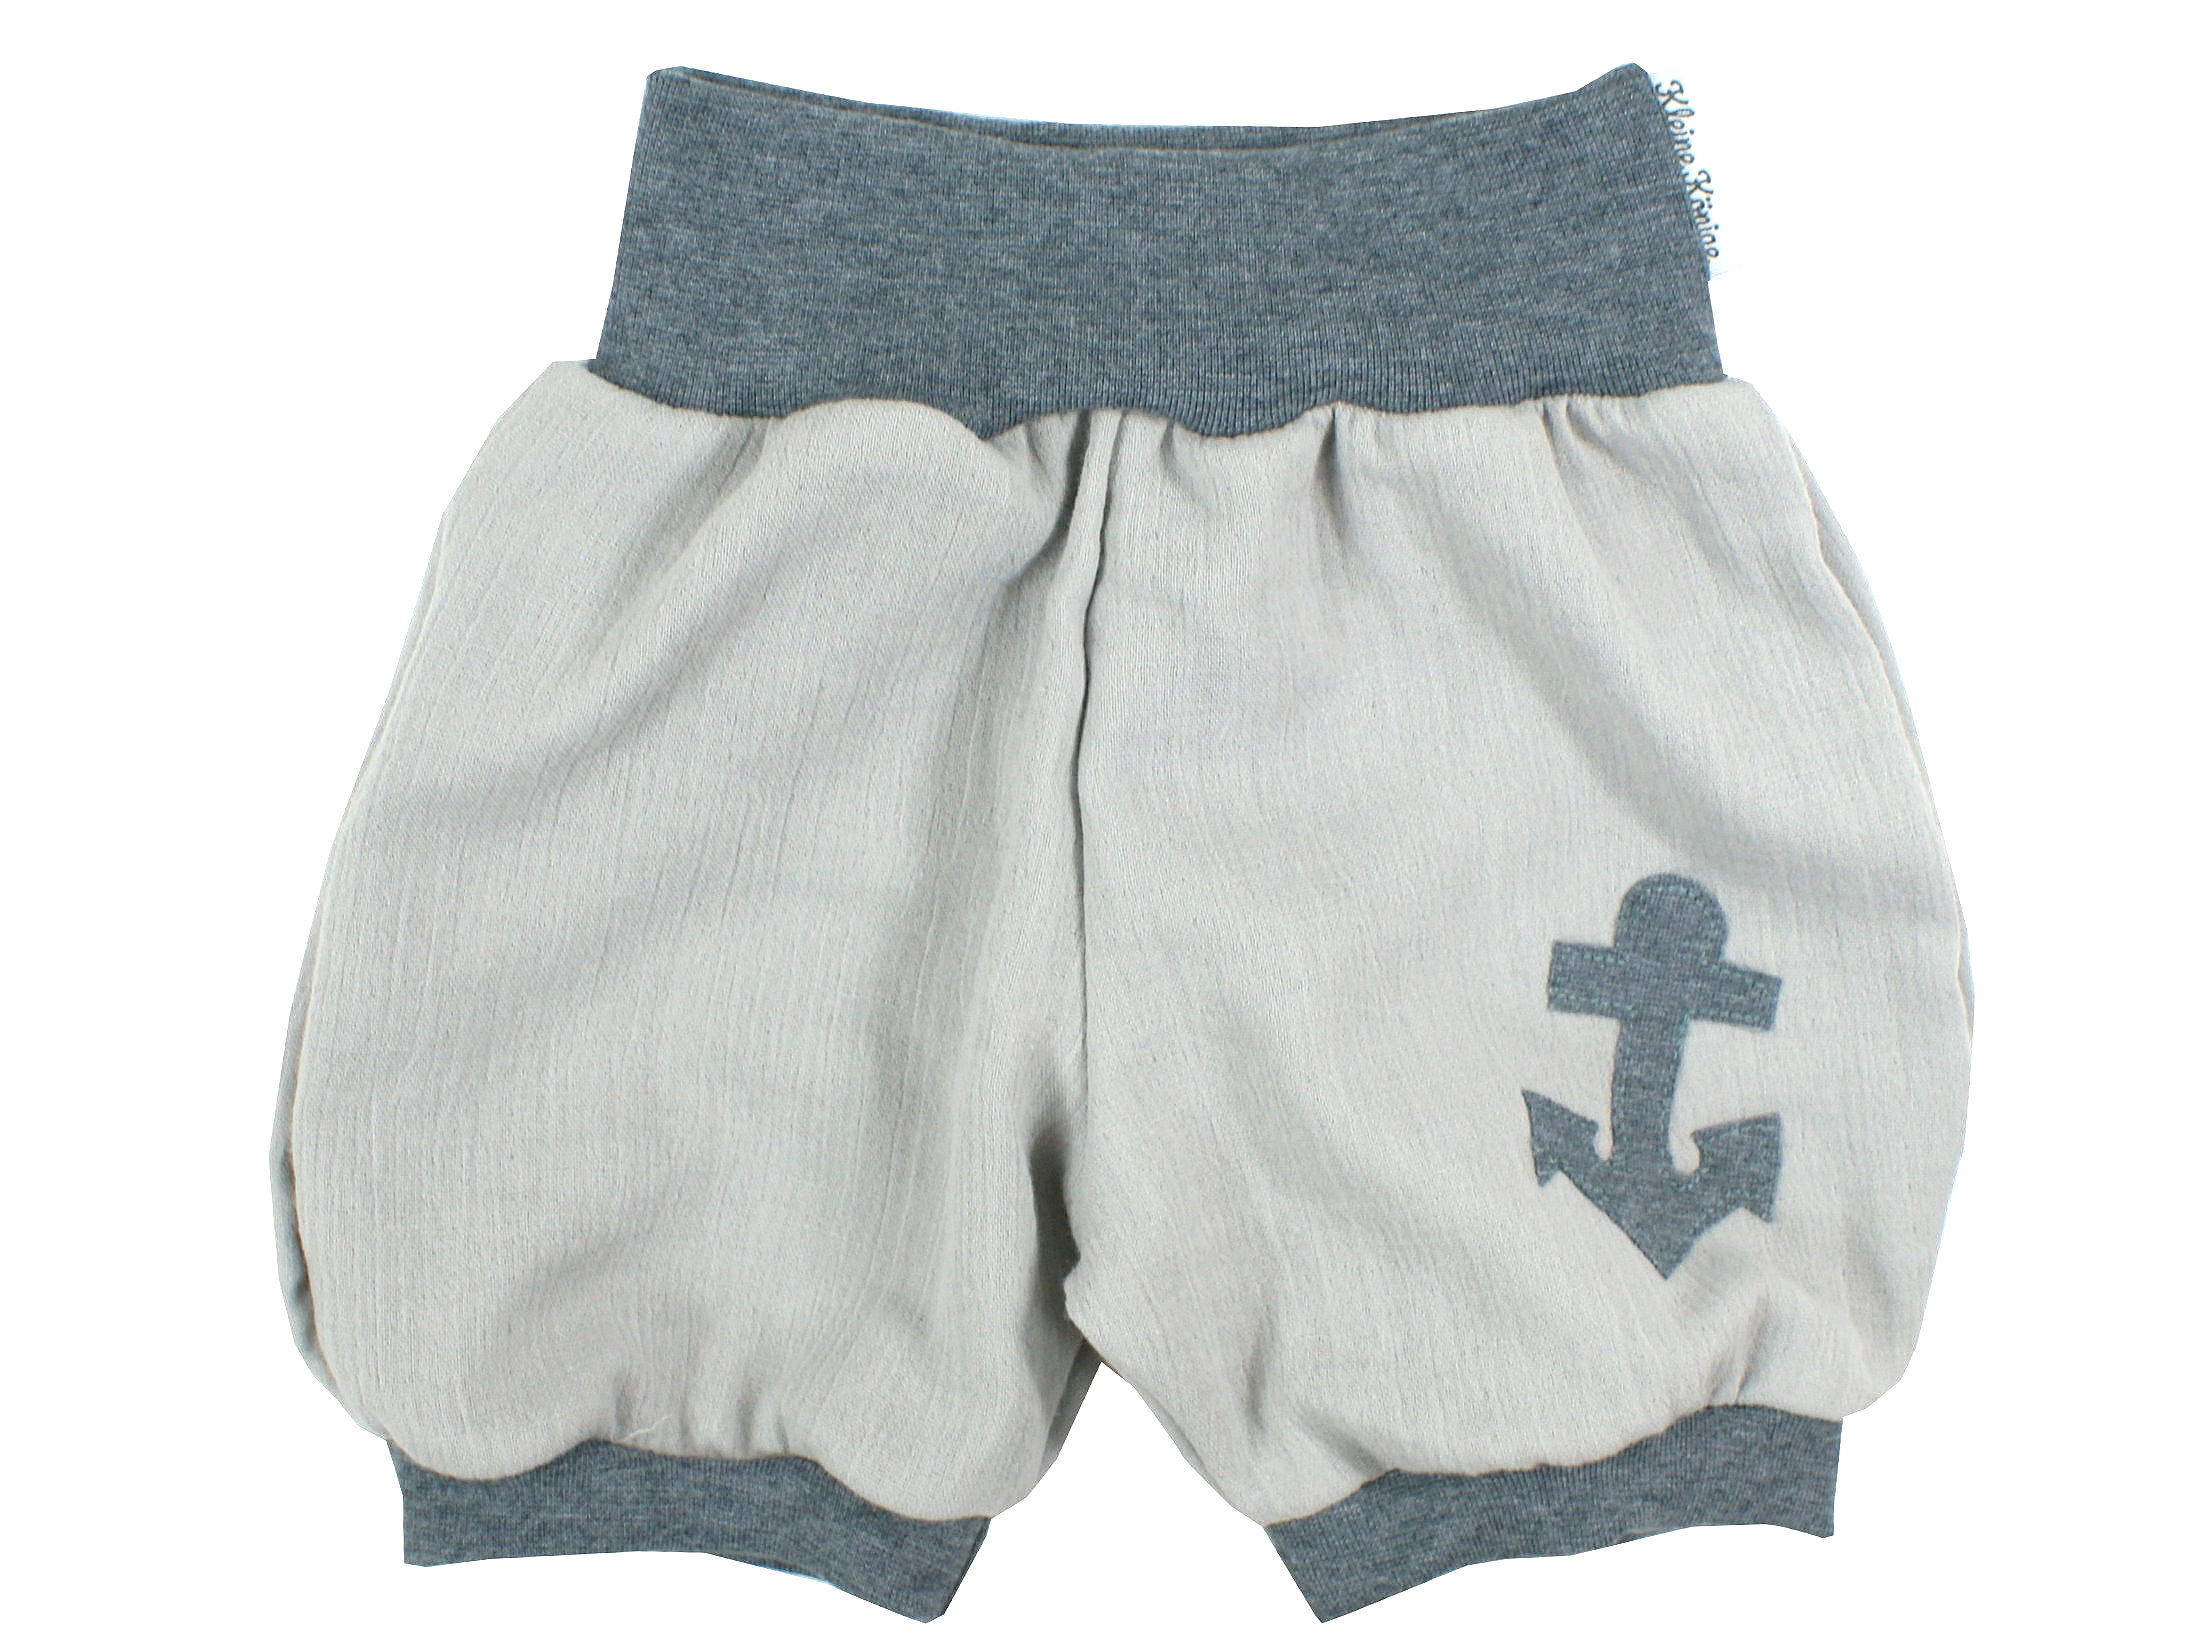 "Musselin Kinder Shorts Anker ""Uni"" grau anthrazit"